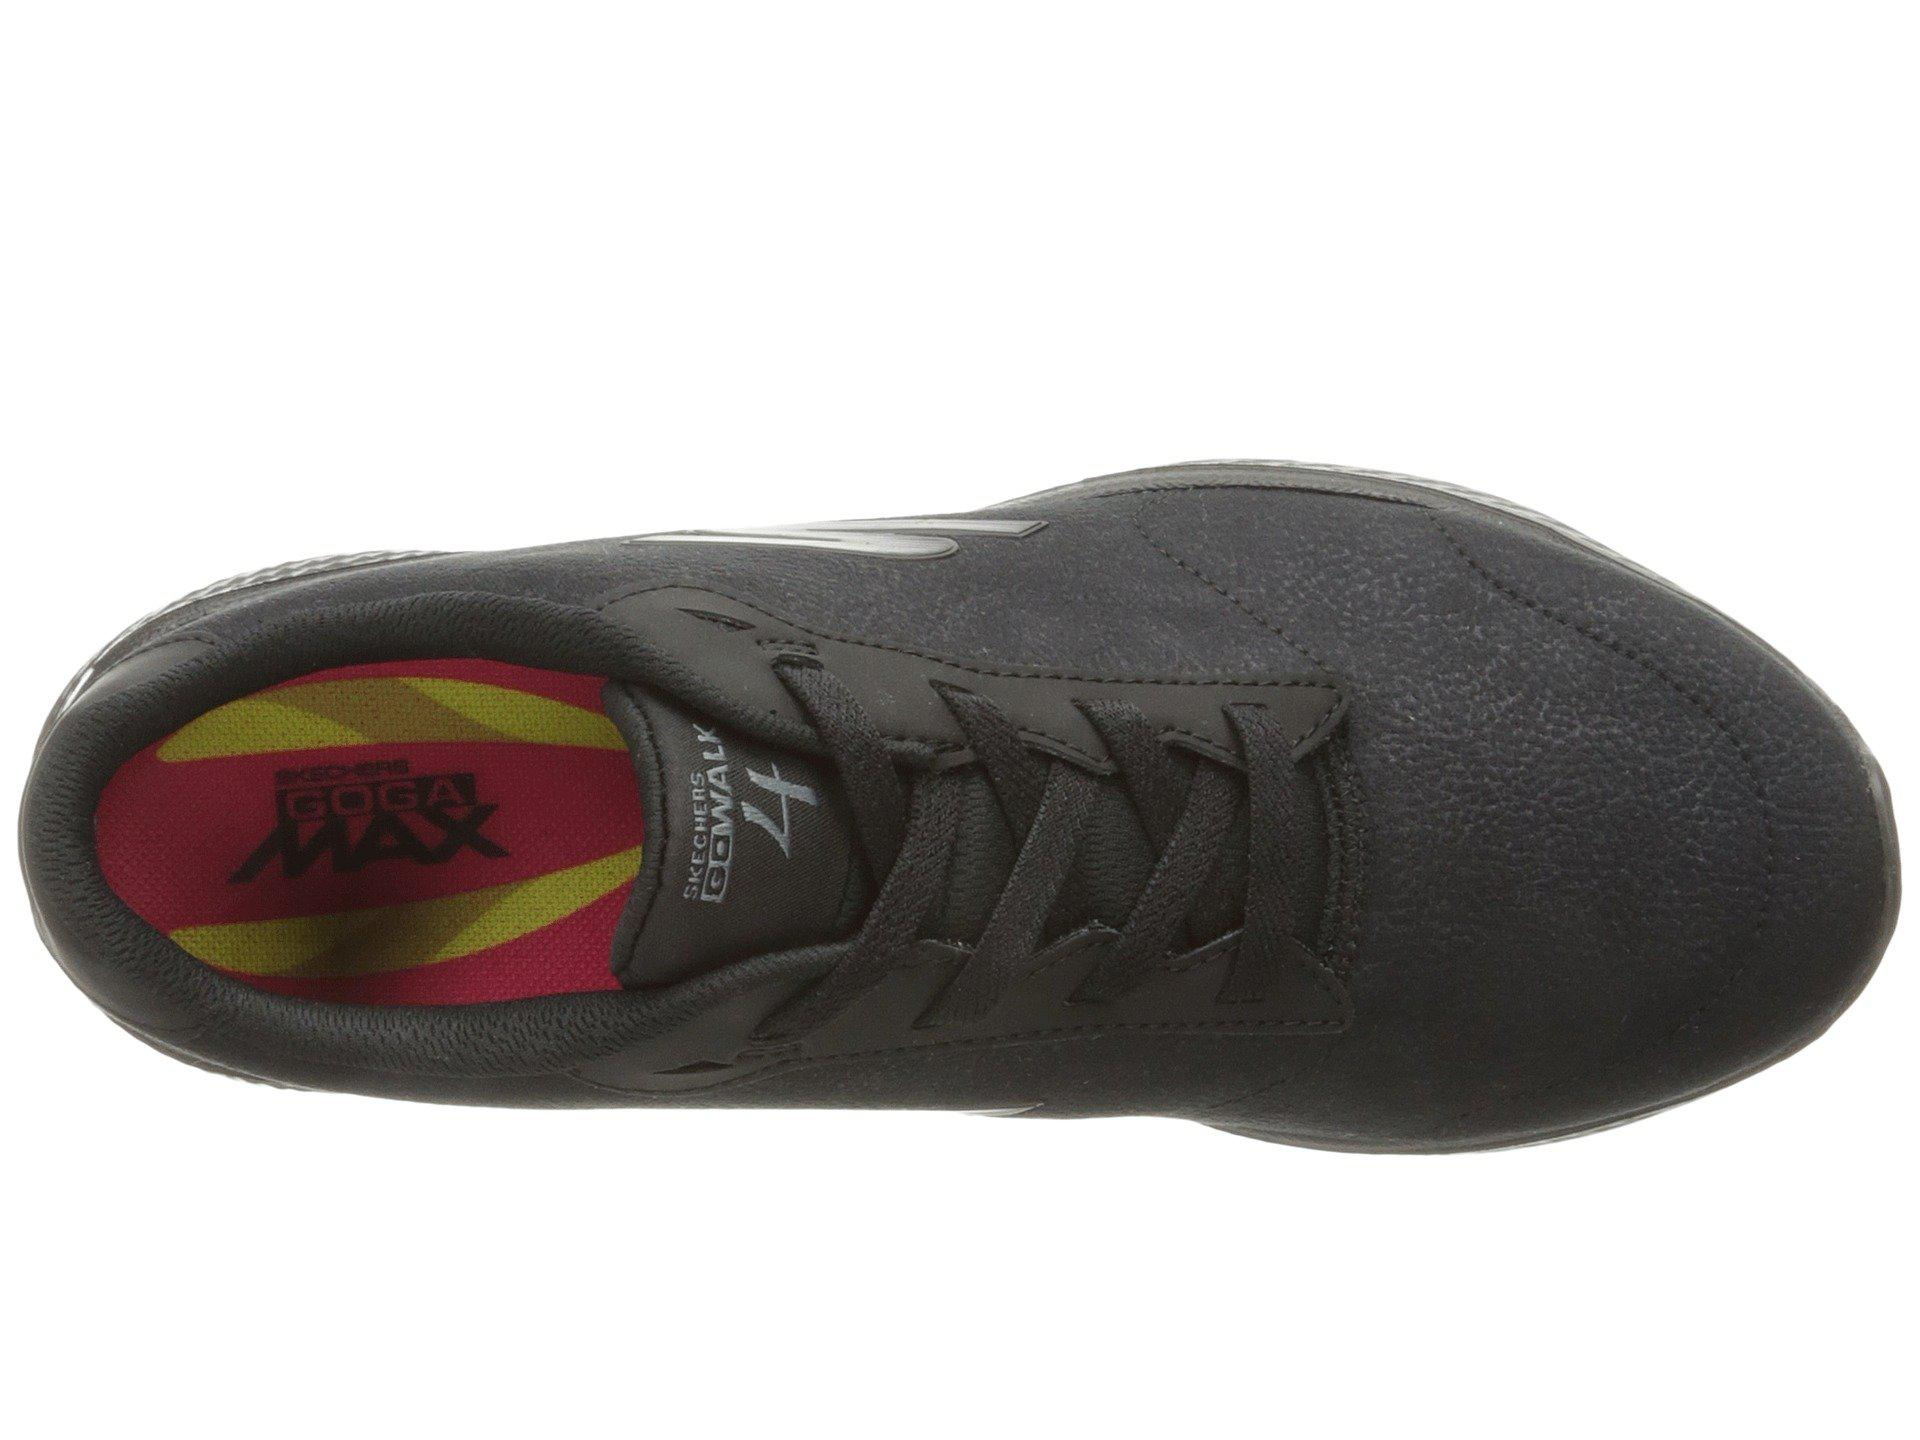 Skechers - Black Go Walk 4 - Premier - Lyst. View fullscreen 8f90ee60e4710